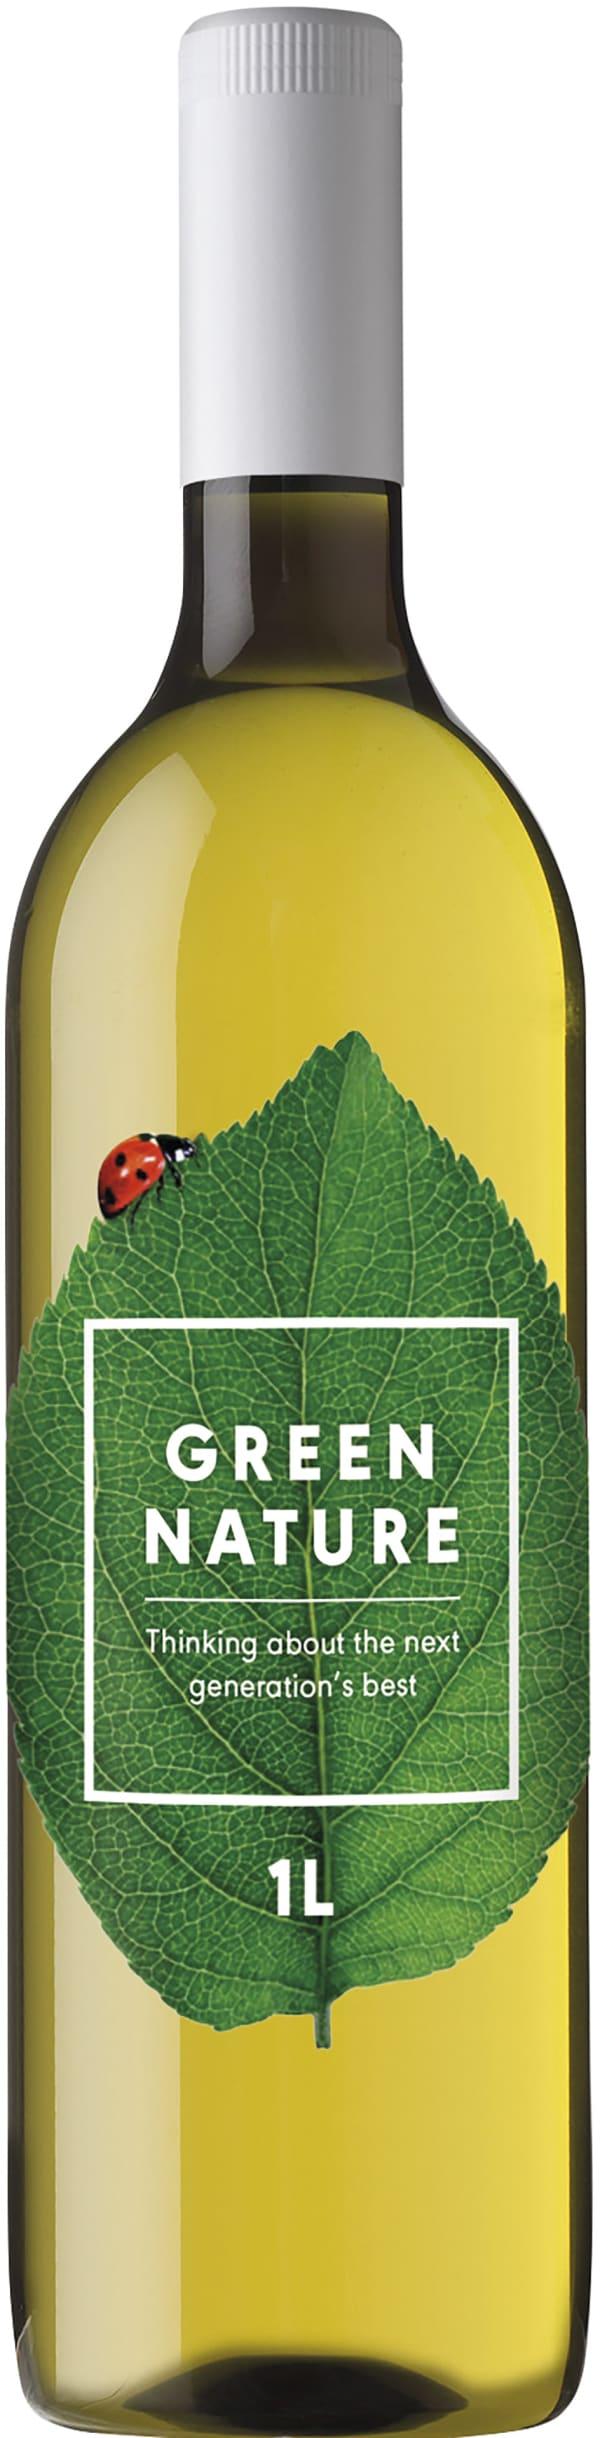 Green Nature 2014 plastflaska